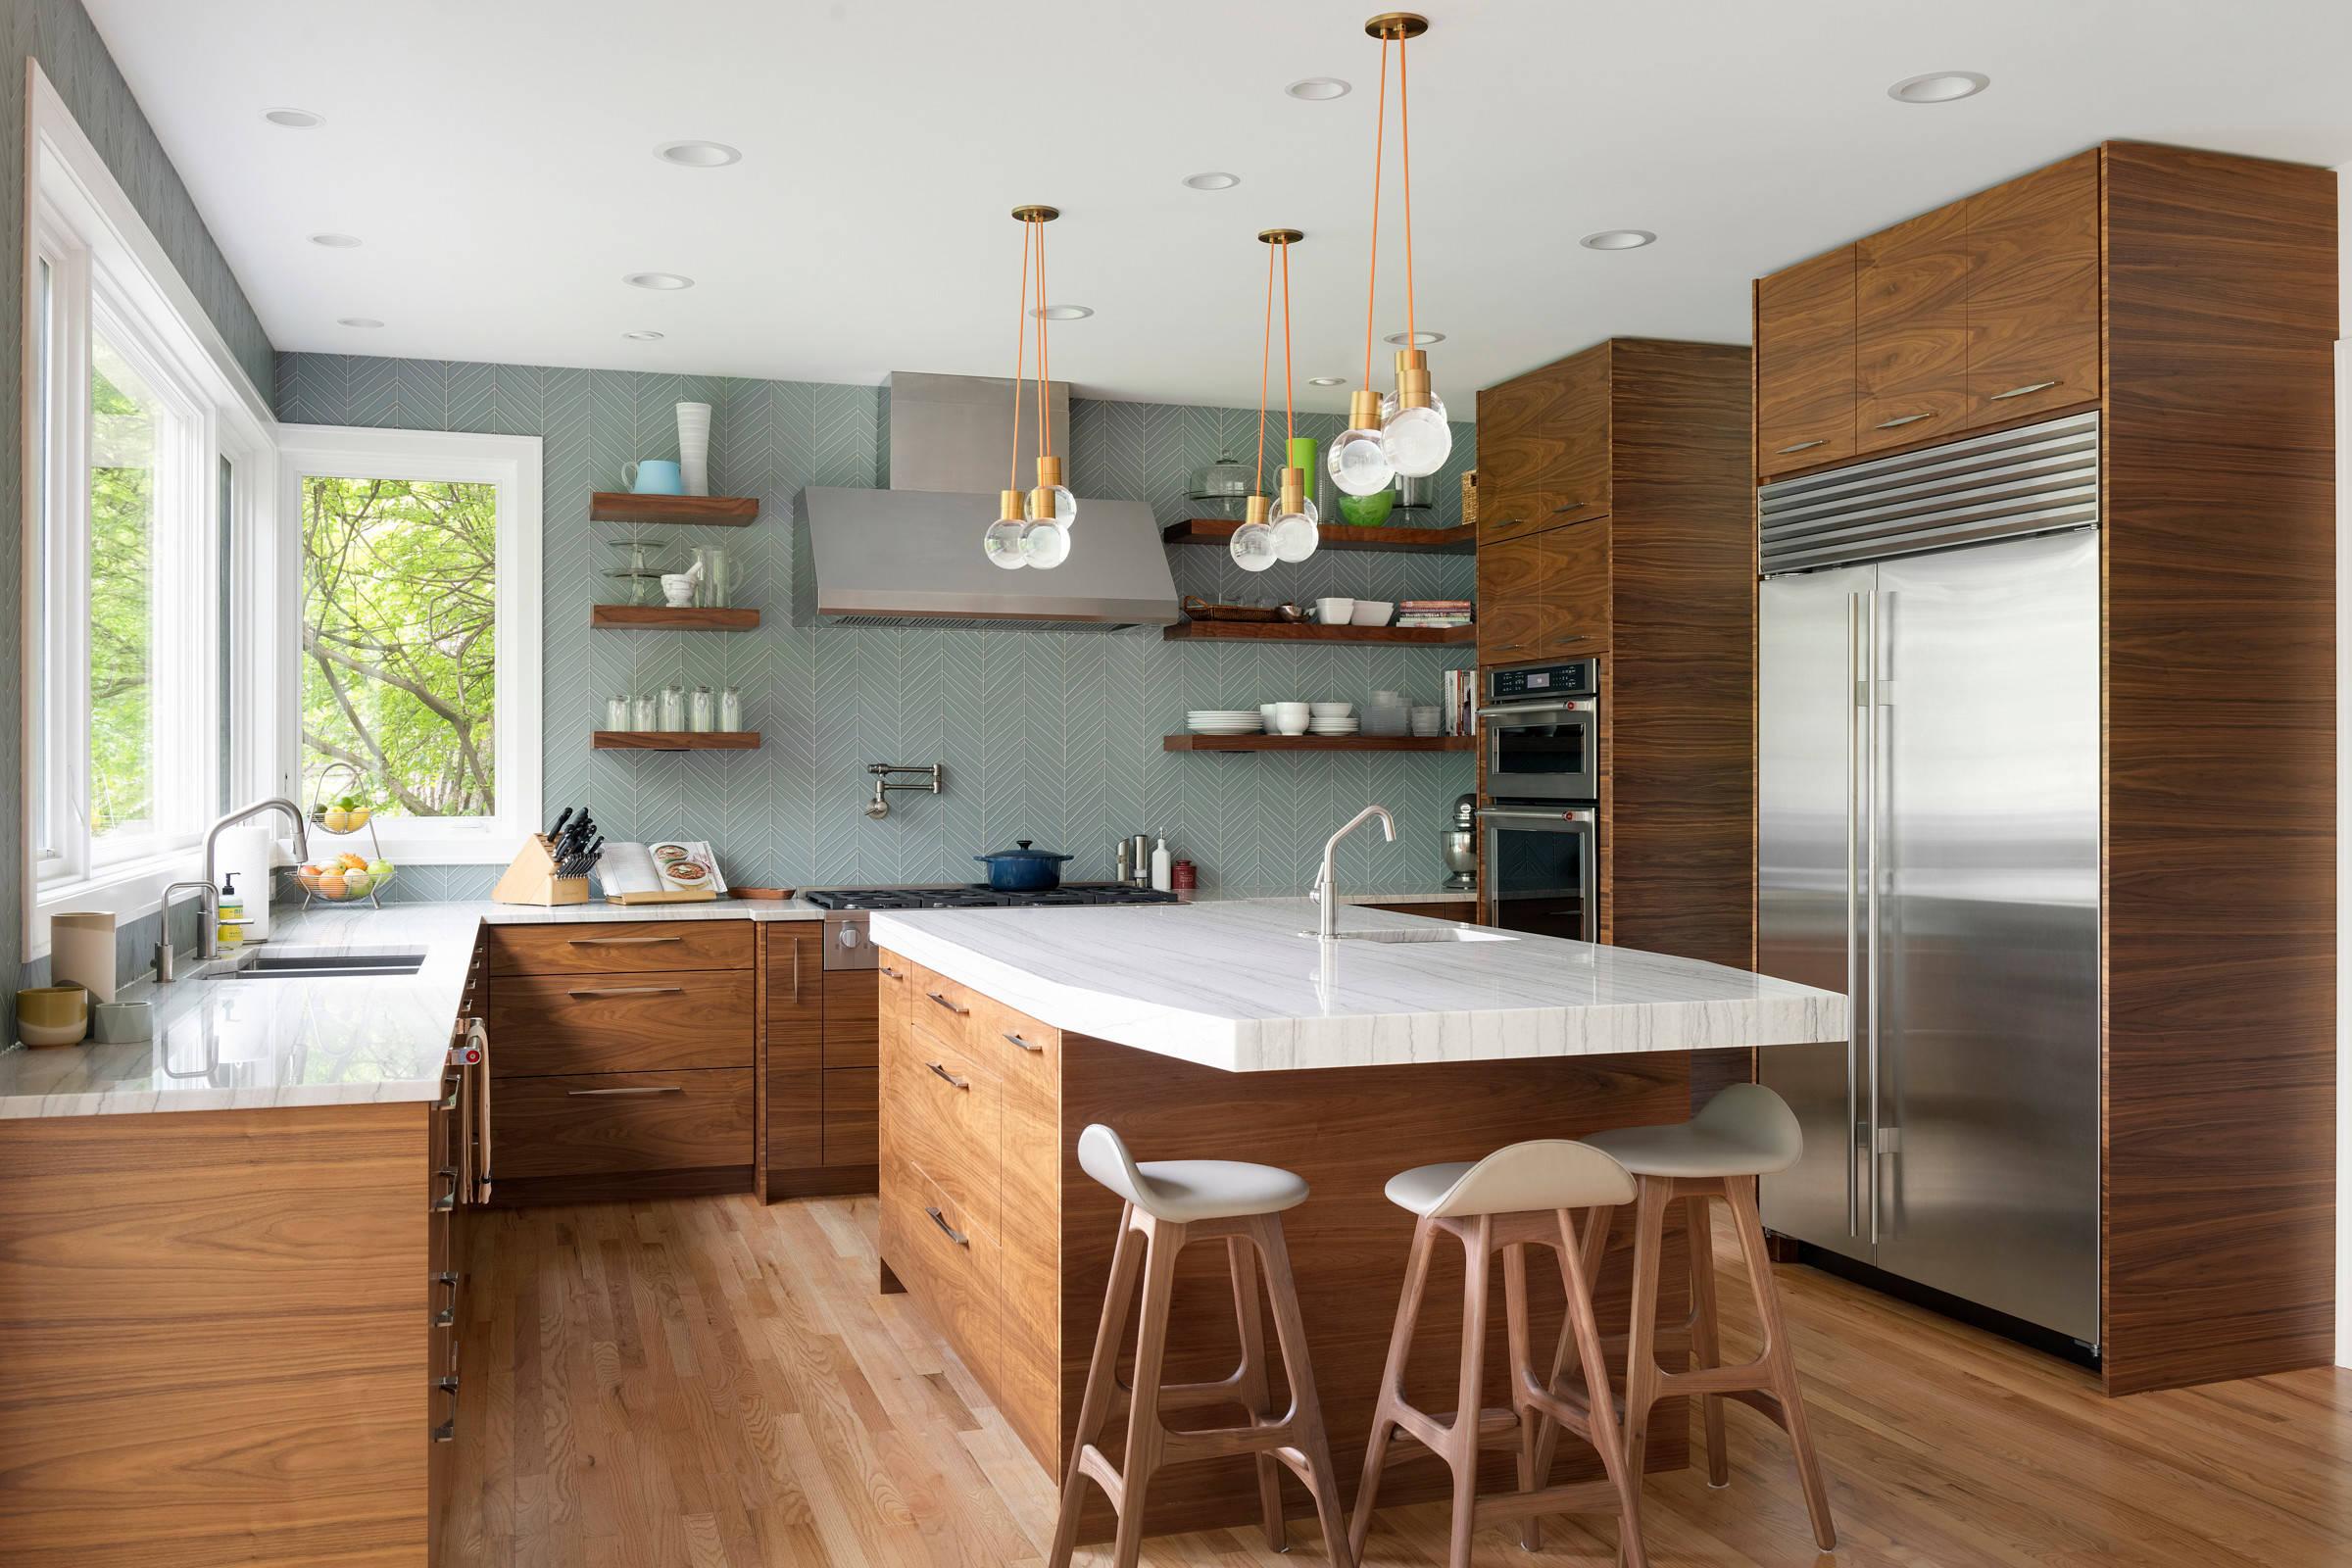 75 Beautiful Mid Century Modern Kitchen Pictures Ideas November 2020 Houzz